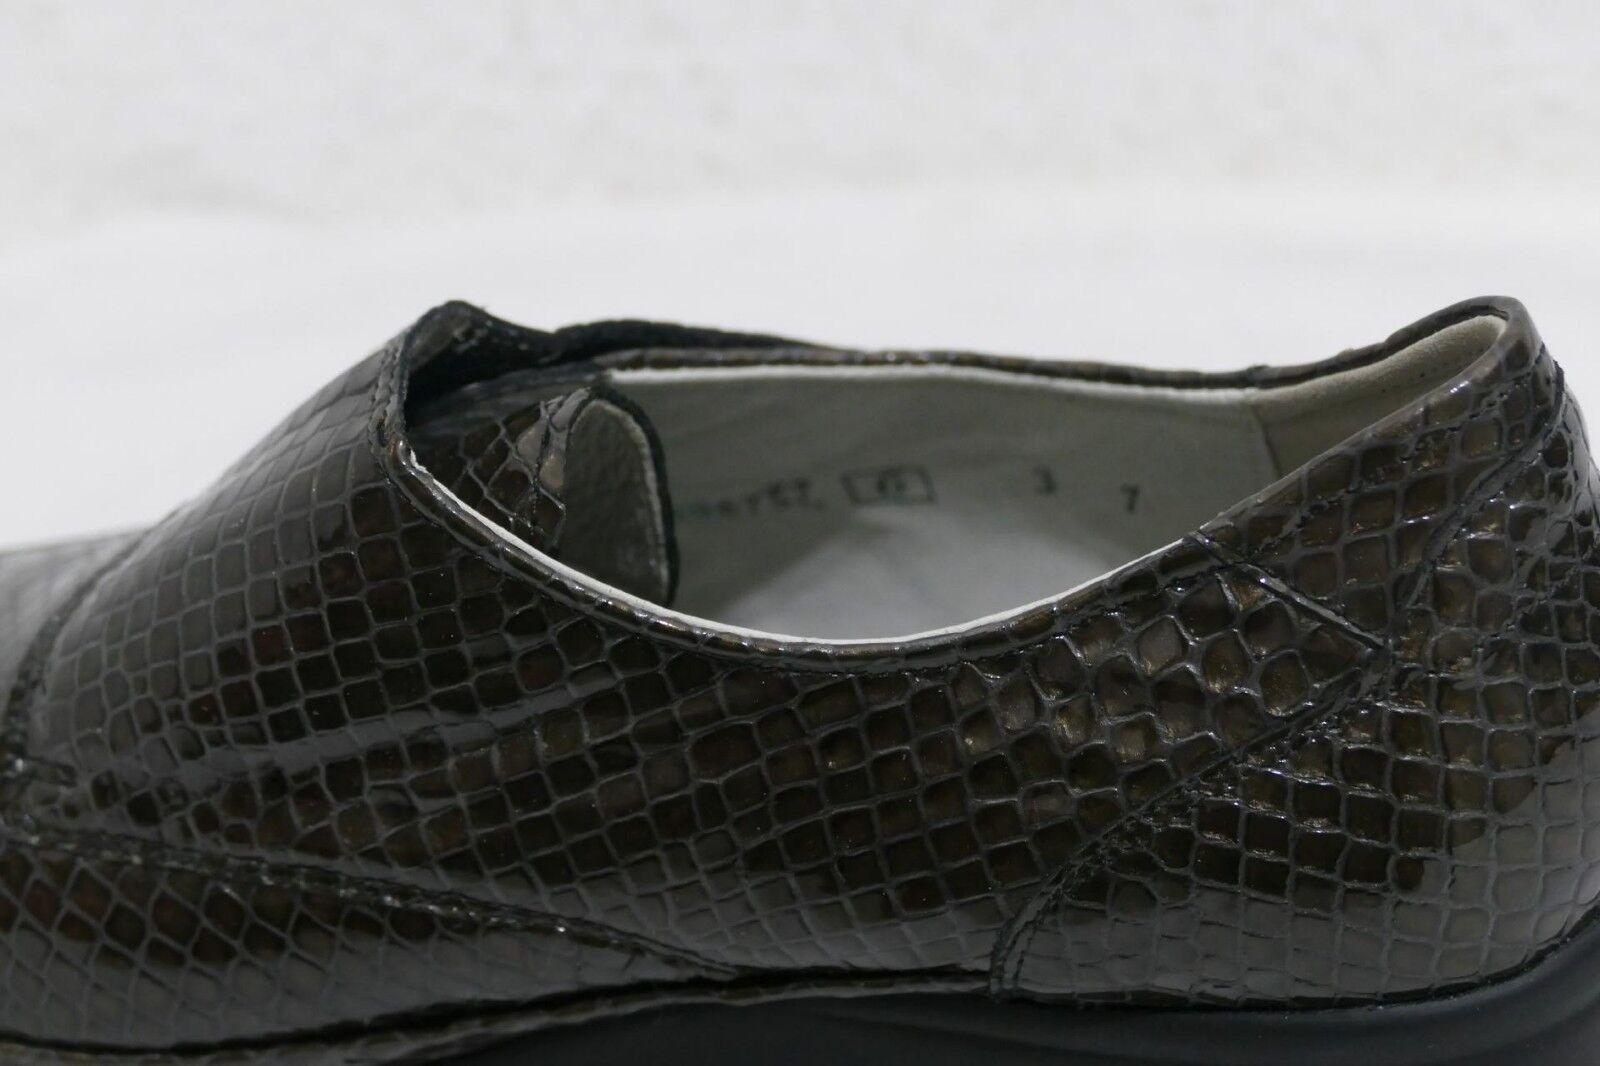 1040---Waldläufer UK 6 6 UK Gr 39 neu  Lackleder braun Schlangenoptik 178e5f